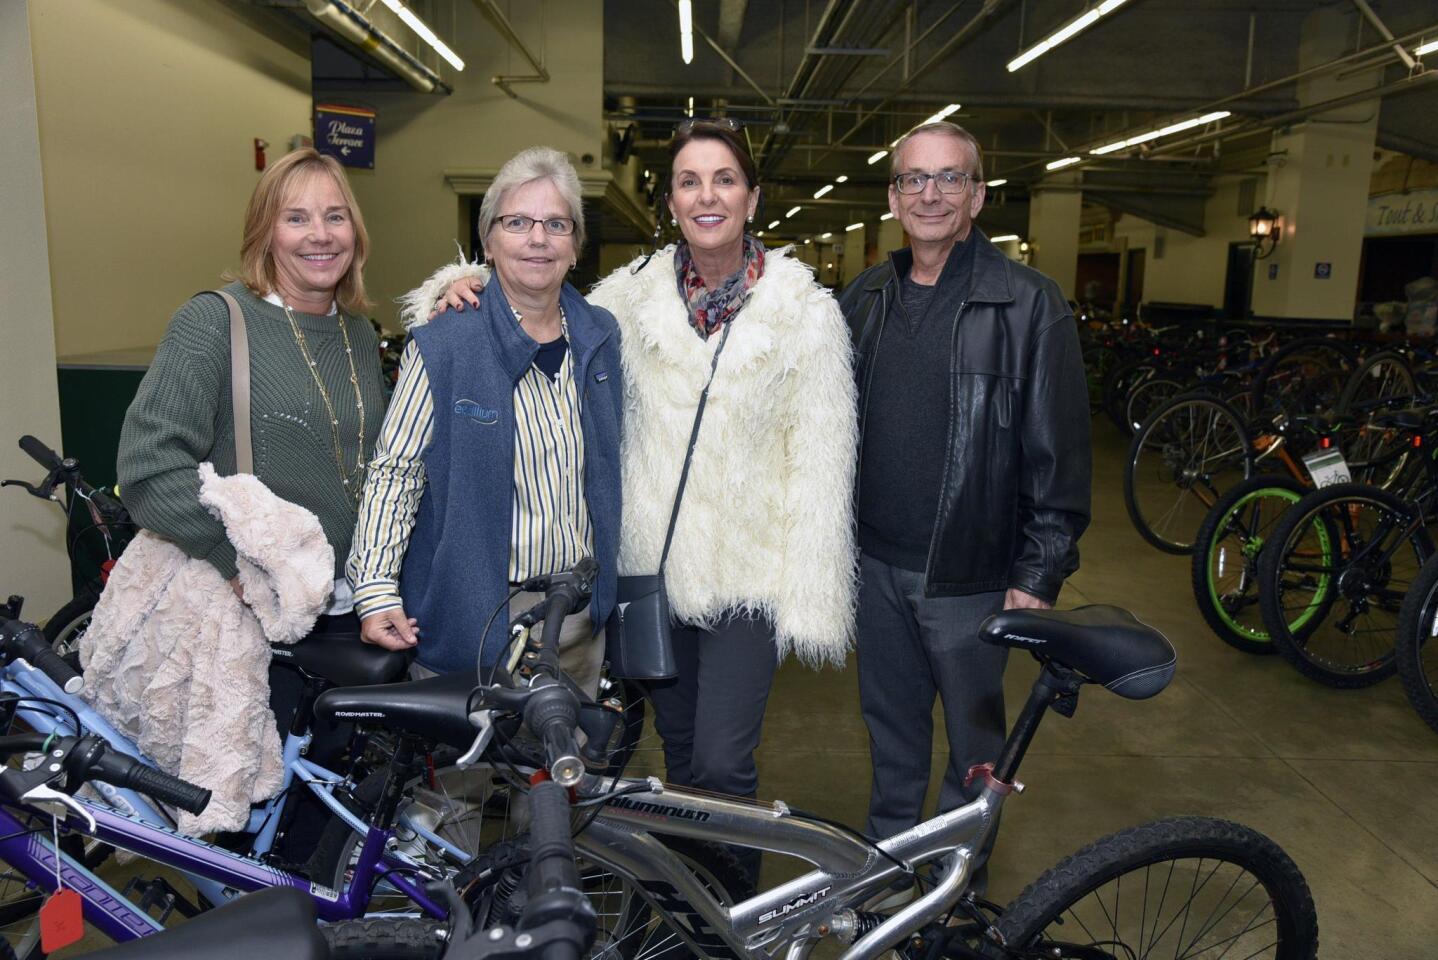 Sponsor Anne Daigle, Judy Daigle, Carly Michaels, sponsor Rich Heyman